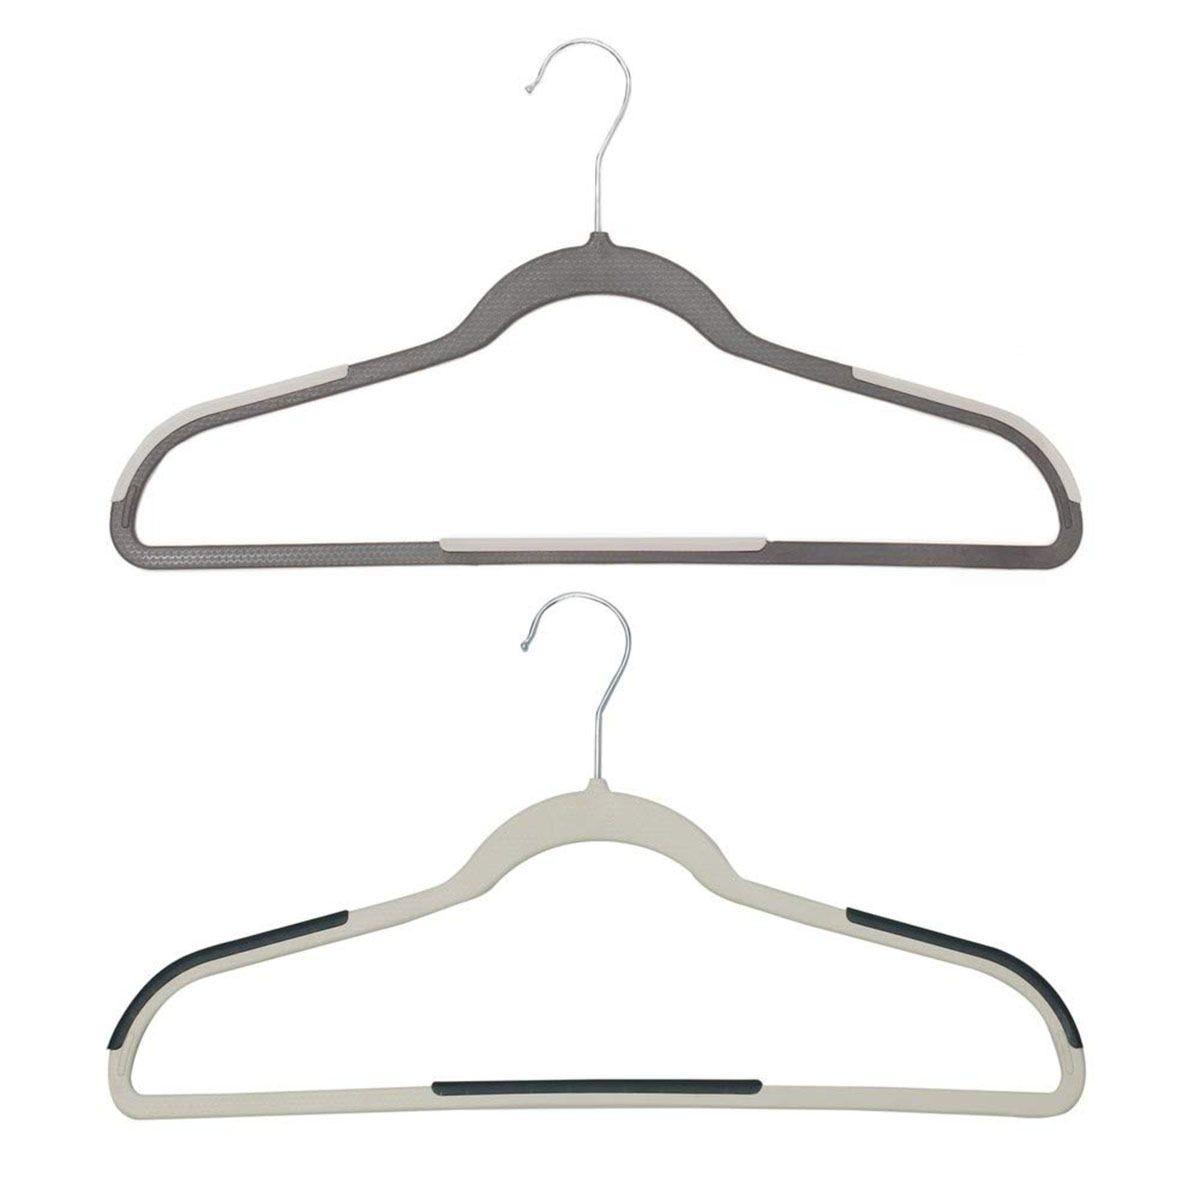 JVL Grey & White Plastic Space Saving Coat Hangers - Pack of 60